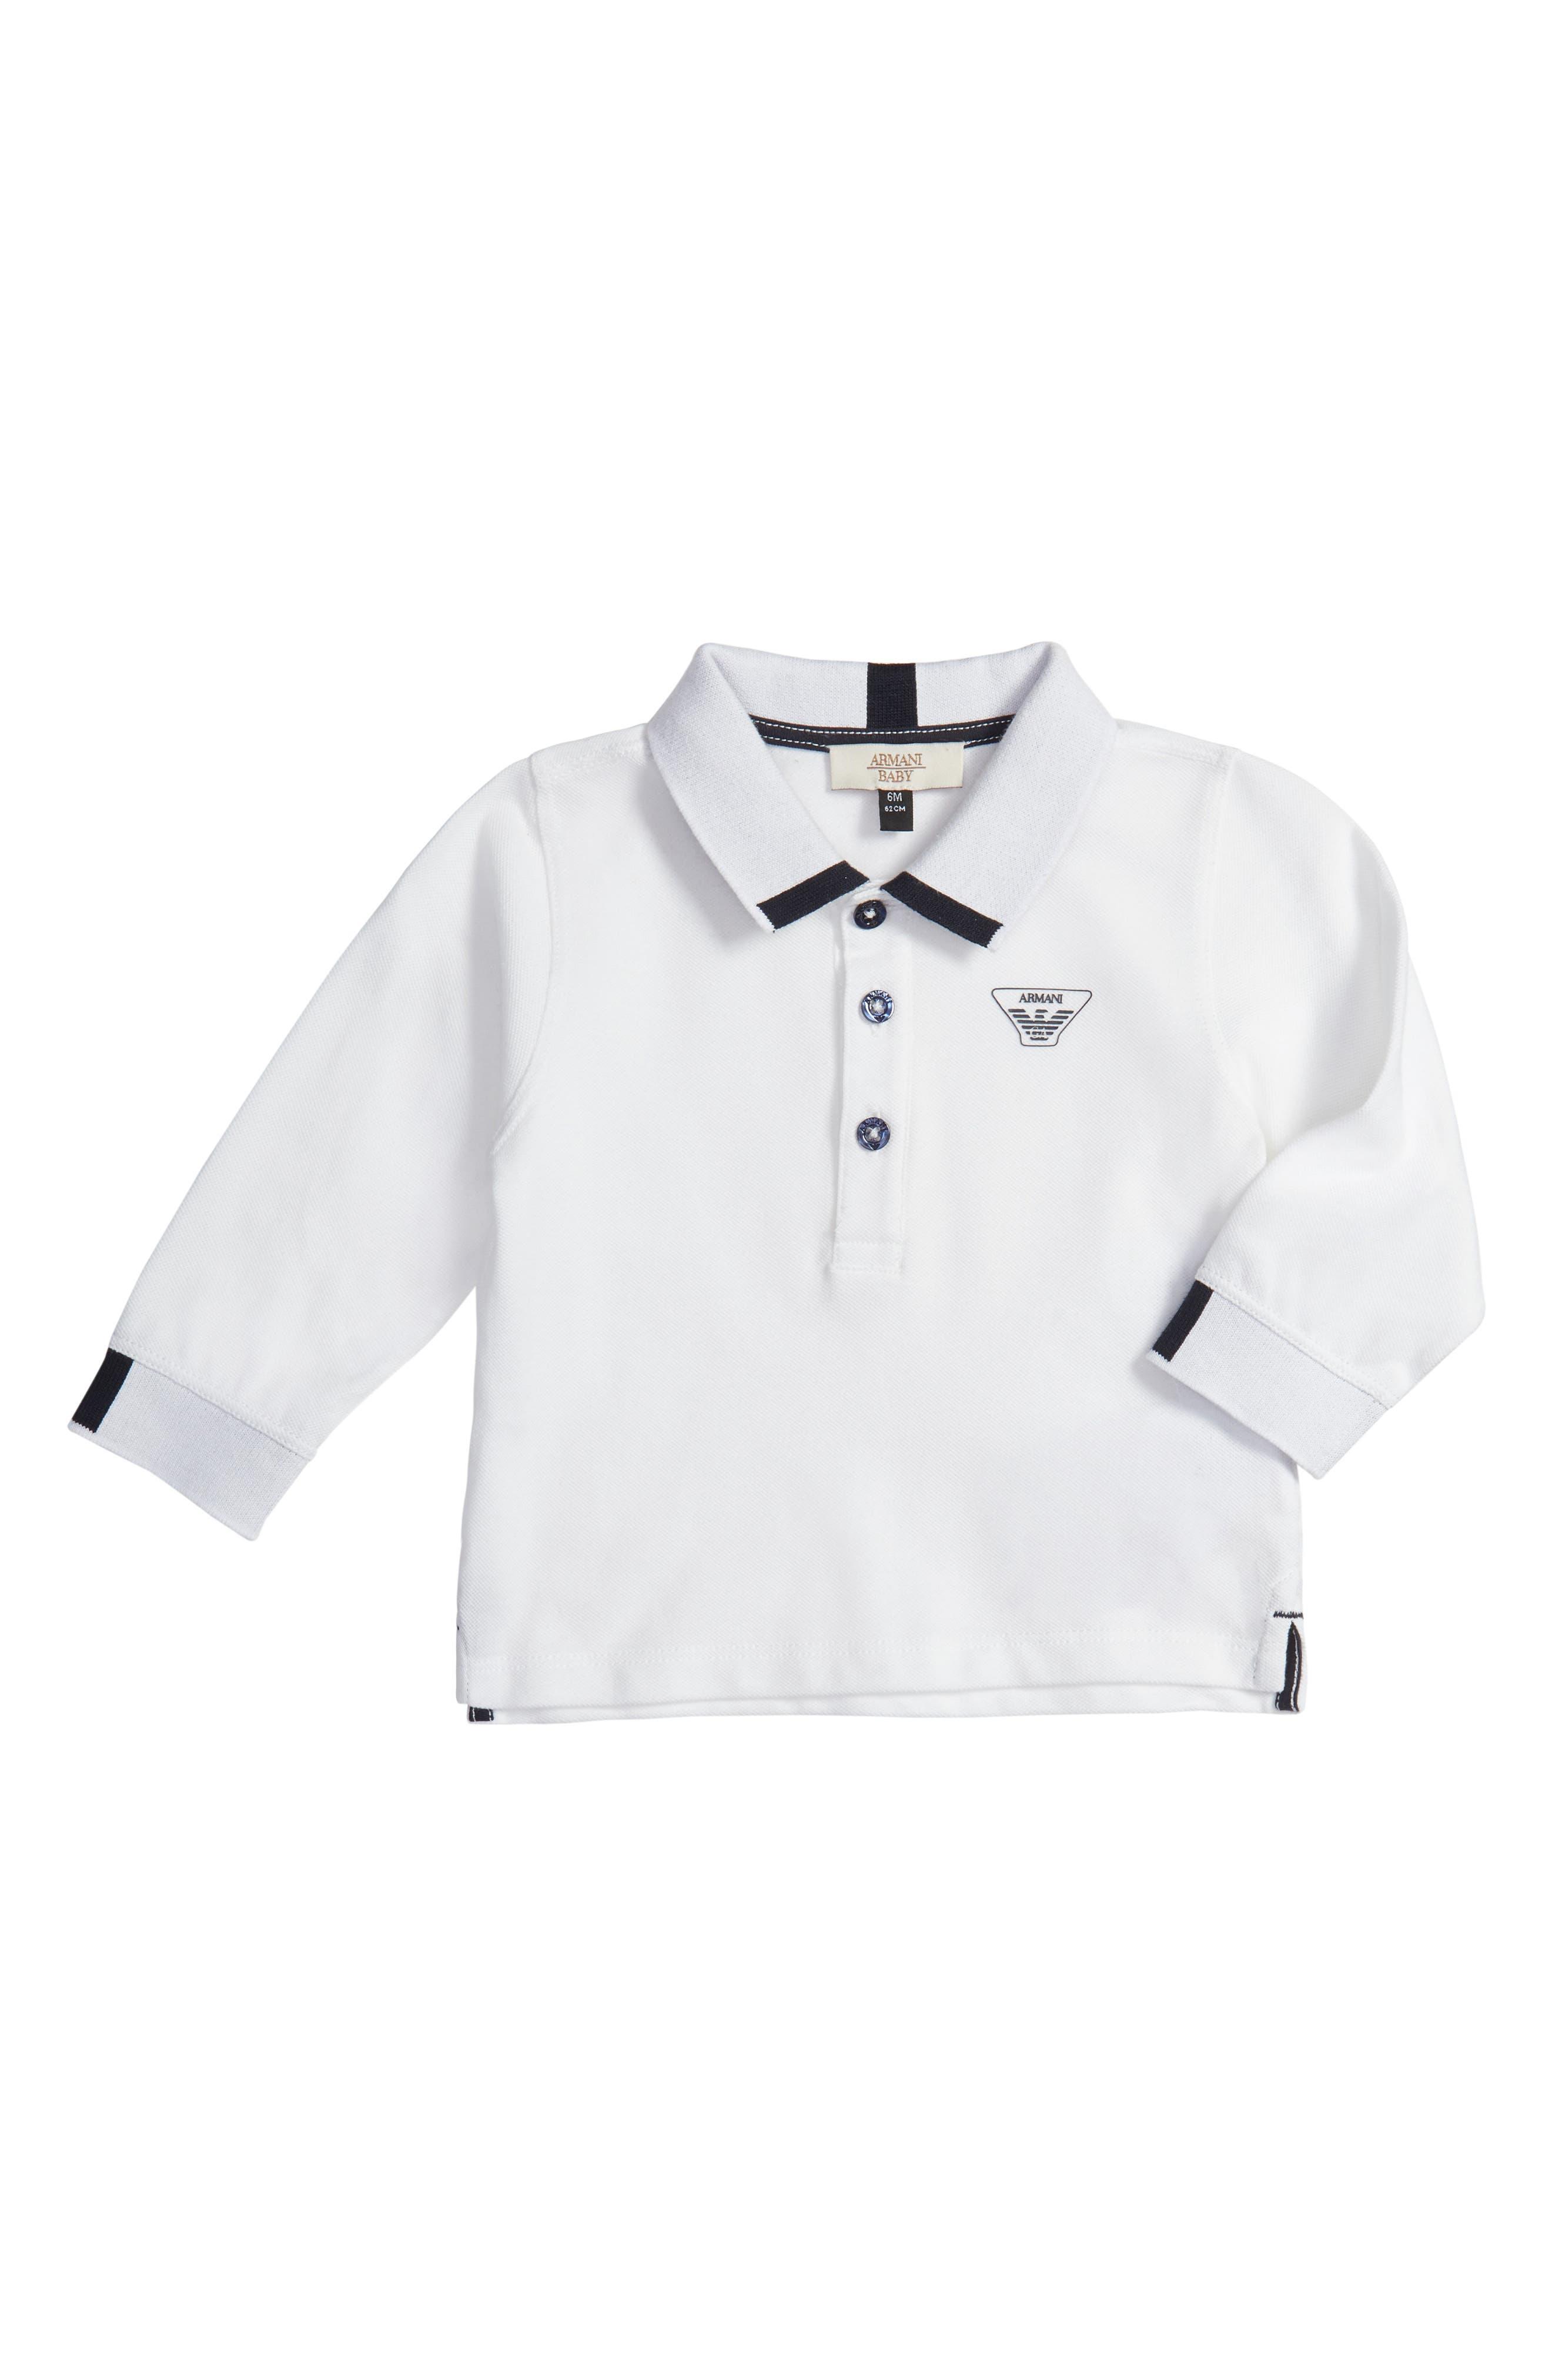 ARMANI JUNIOR Long Sleeve Piqué Polo